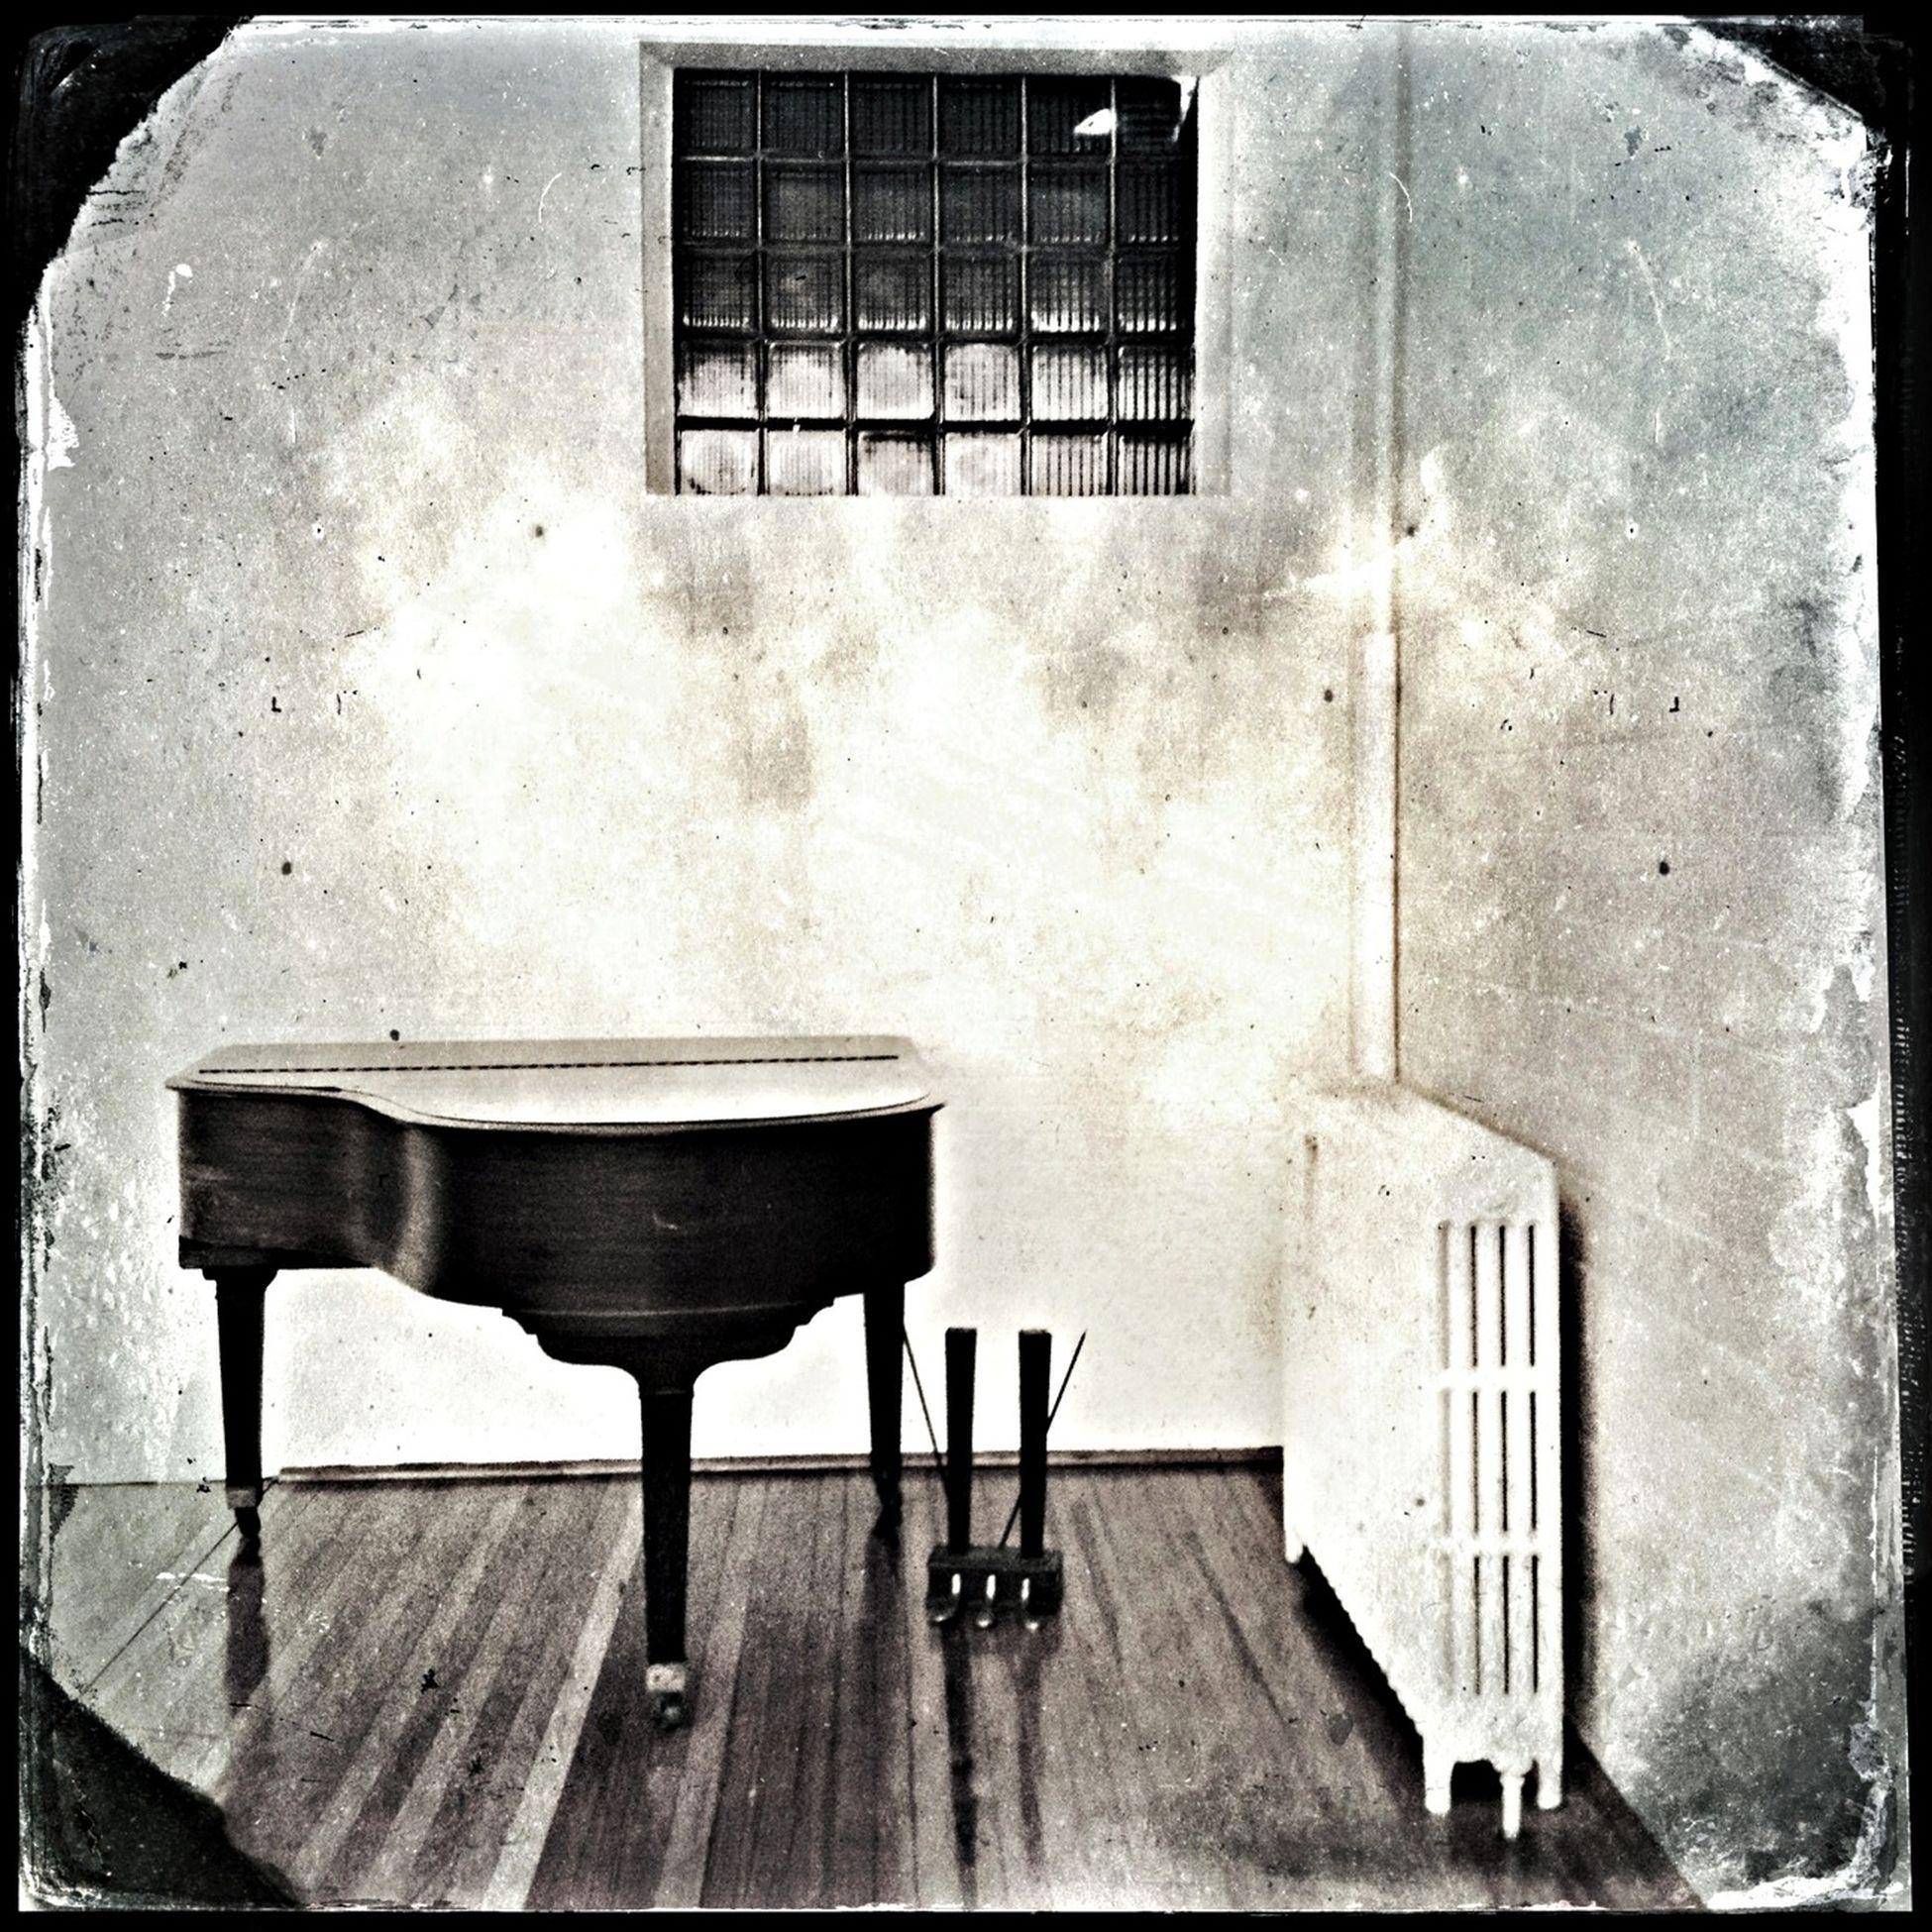 Abandoned & Derelict Filthyfeeds Hipstalover Grunge Music